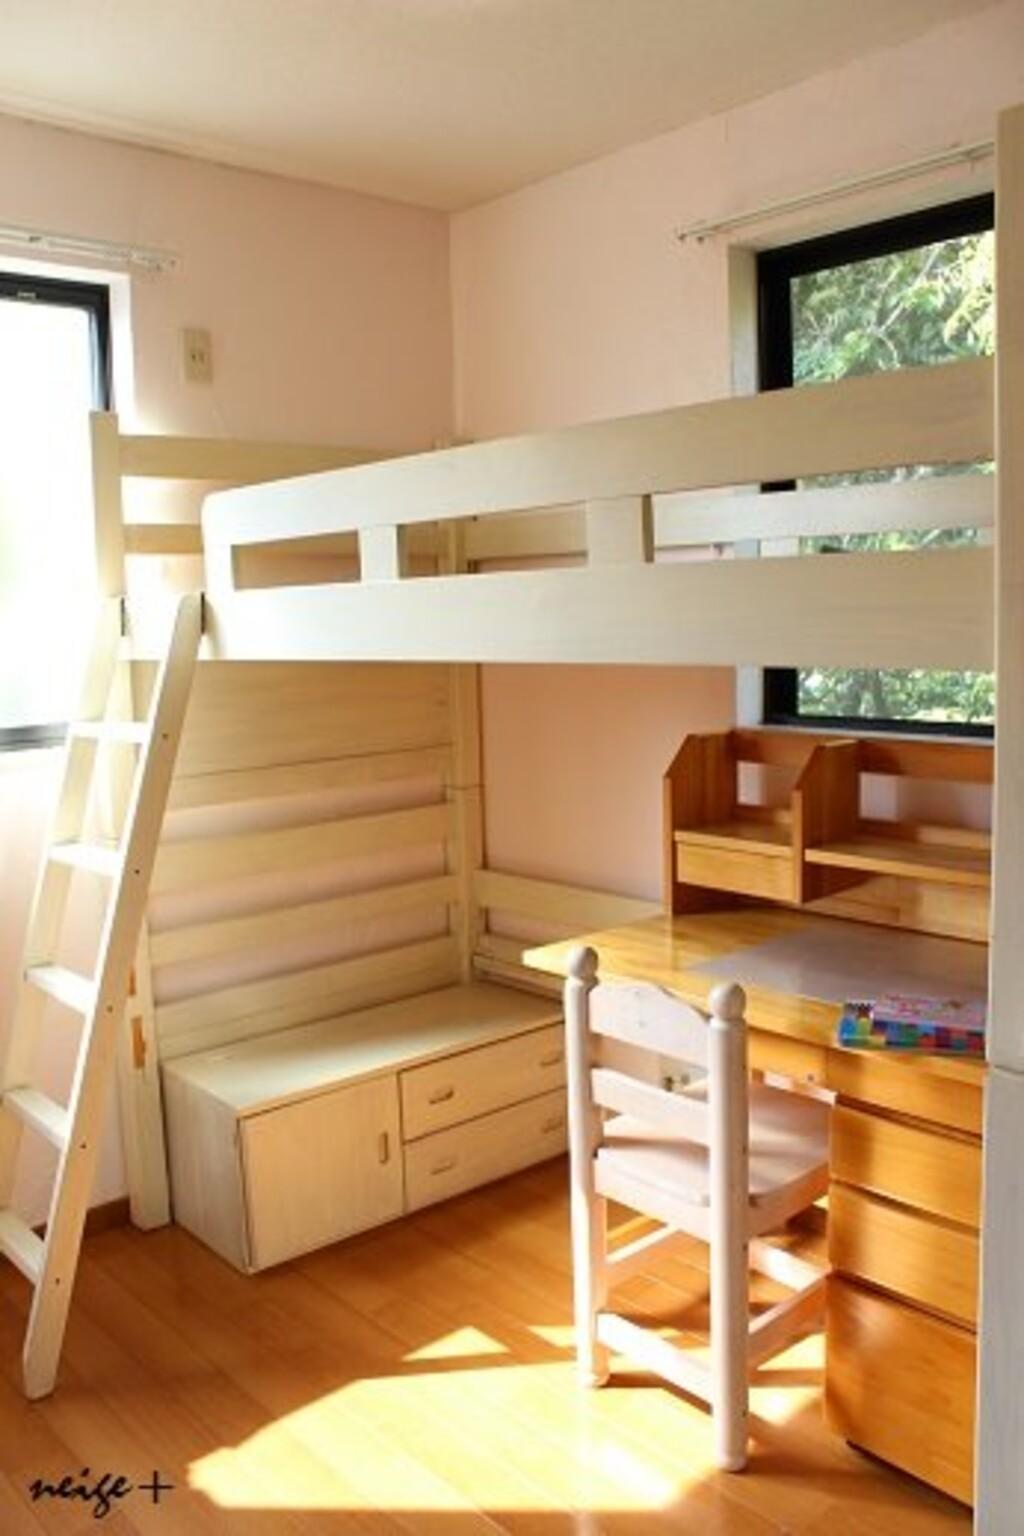 【diy子供部屋のリフォーム③】2段ベッドを子供が憧れるロフトベッドにリメイク! limia リミア